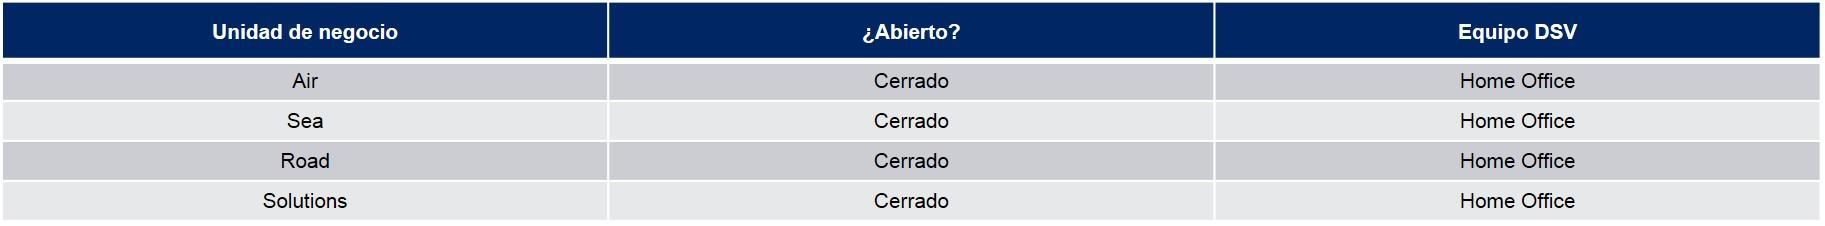 Tabla Operaciones Uruguay COVID-19 03-04-20